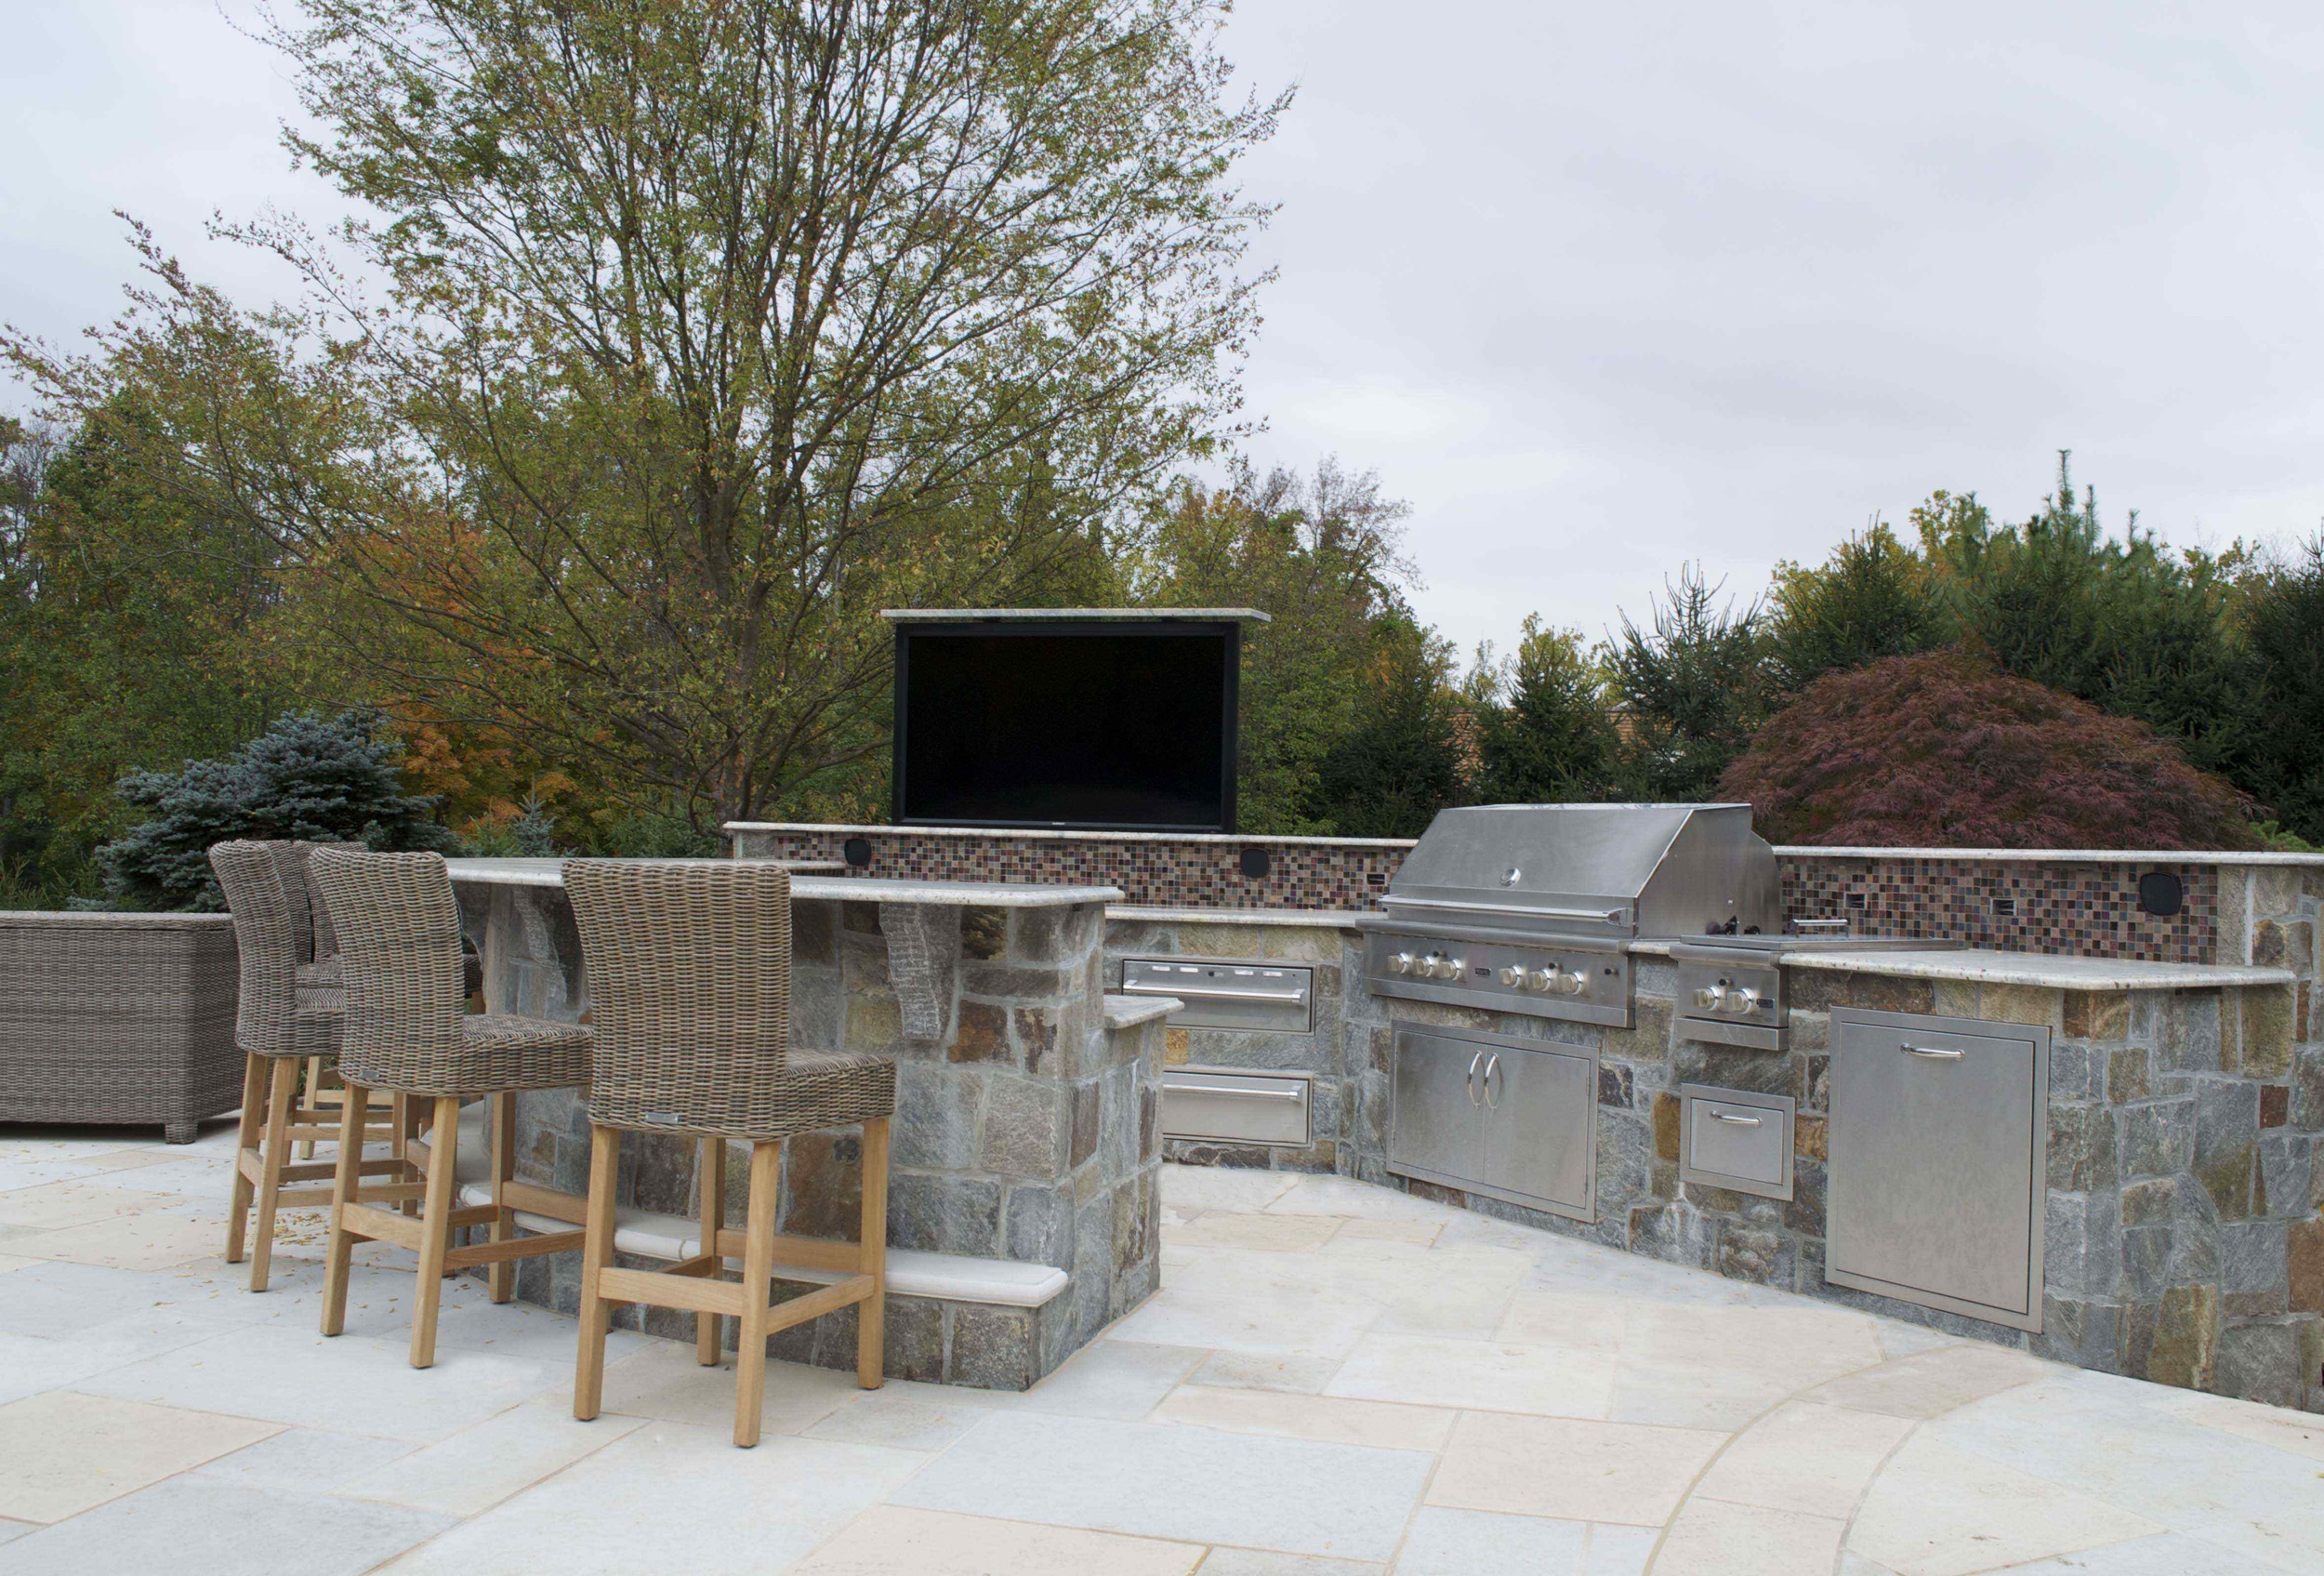 Luxury outdoor kitchen design with 60 inch TV on lift- Bergen County Northen NJ.jpg